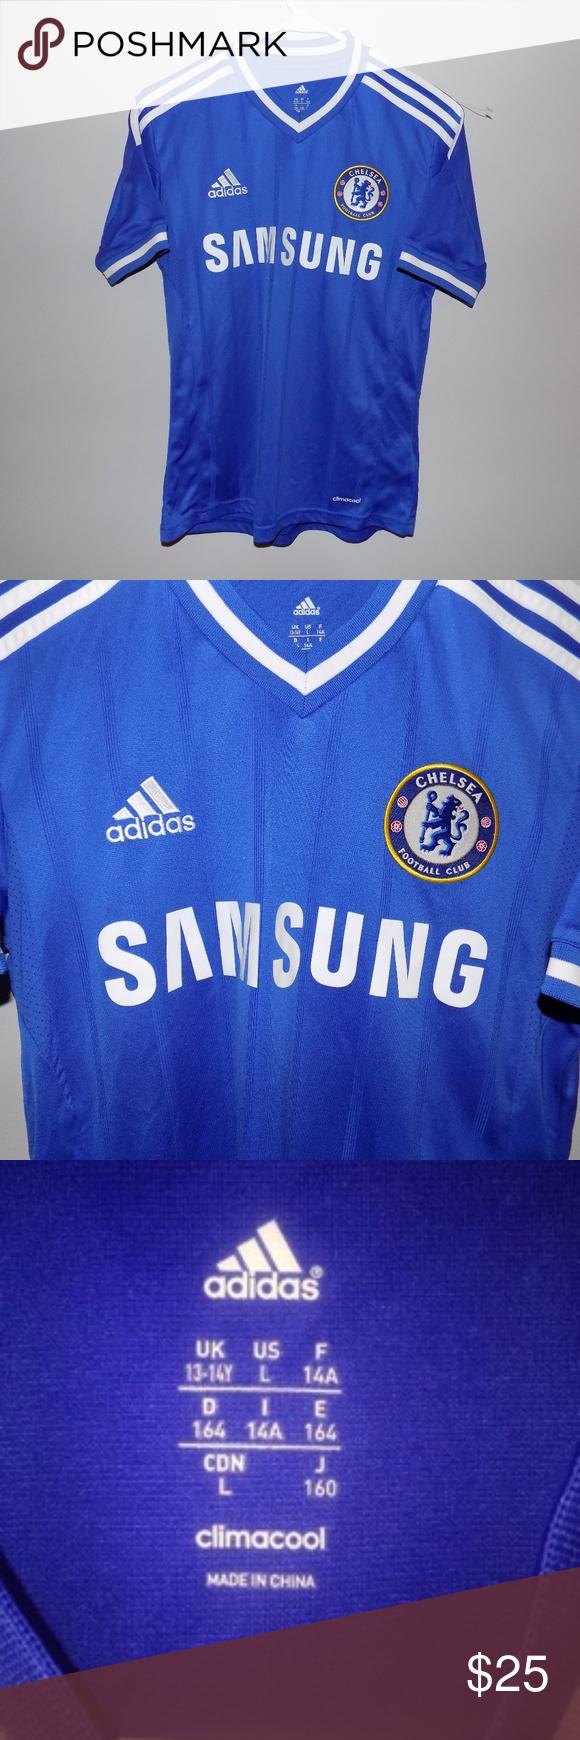 cheap for discount 083d4 04b8f Men s Adidas Samsung Chelsea Soccer Jersey Men s Adidas Samsung Chelsea  Soccer Jersey. Still in excellent